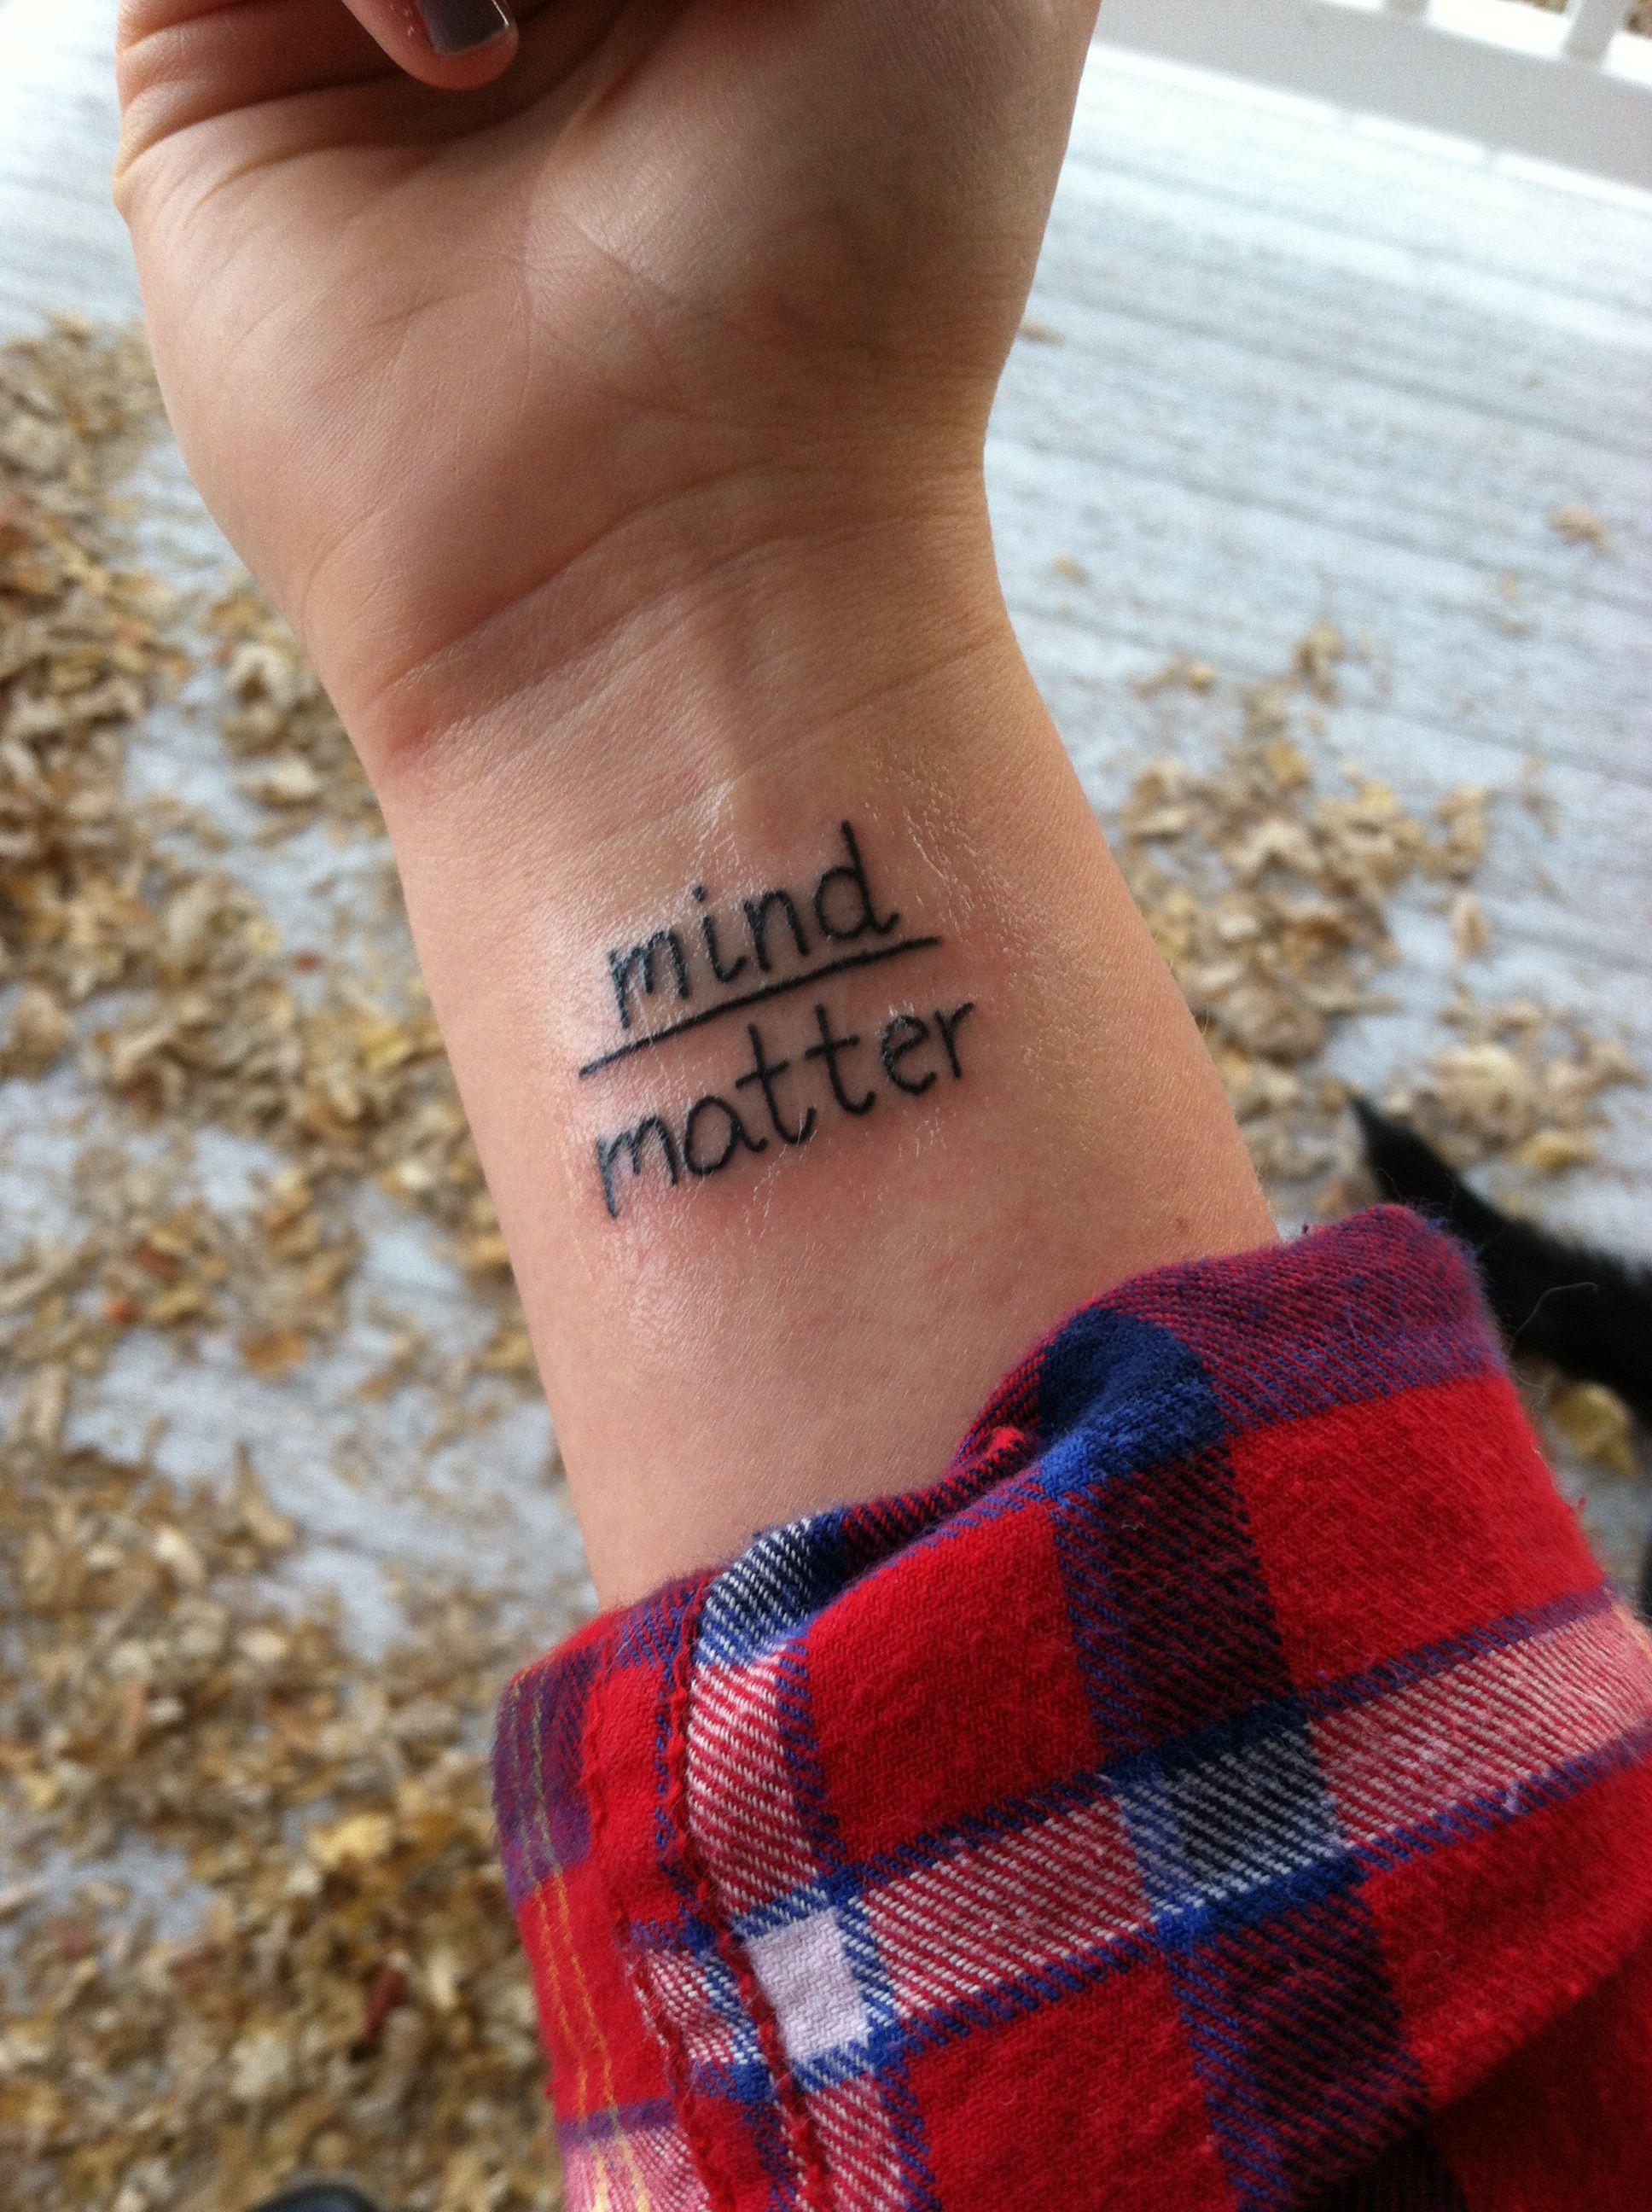 6 Sheets Wrist Body Art Henna Tattoo Stencil Flower: Mind Over Matter Wrist Tattoo.